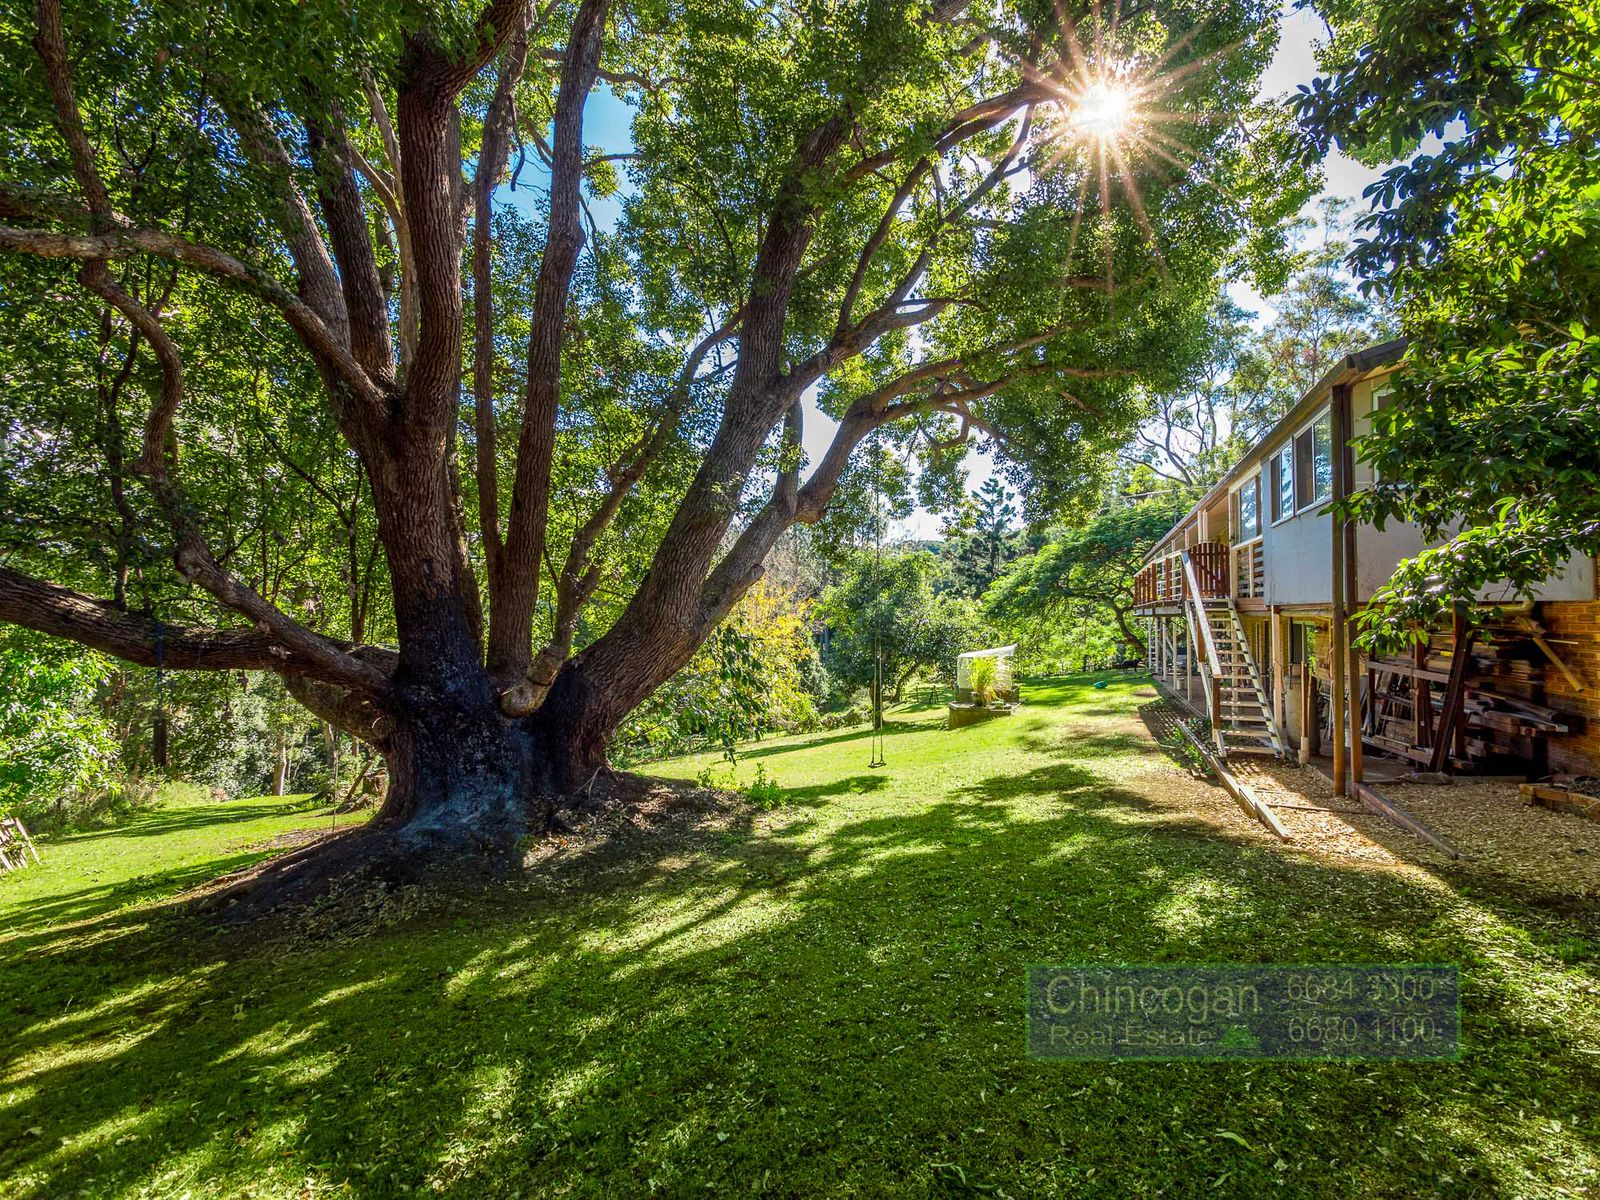 1111 Coolamon Scenic Drive, Montecollum